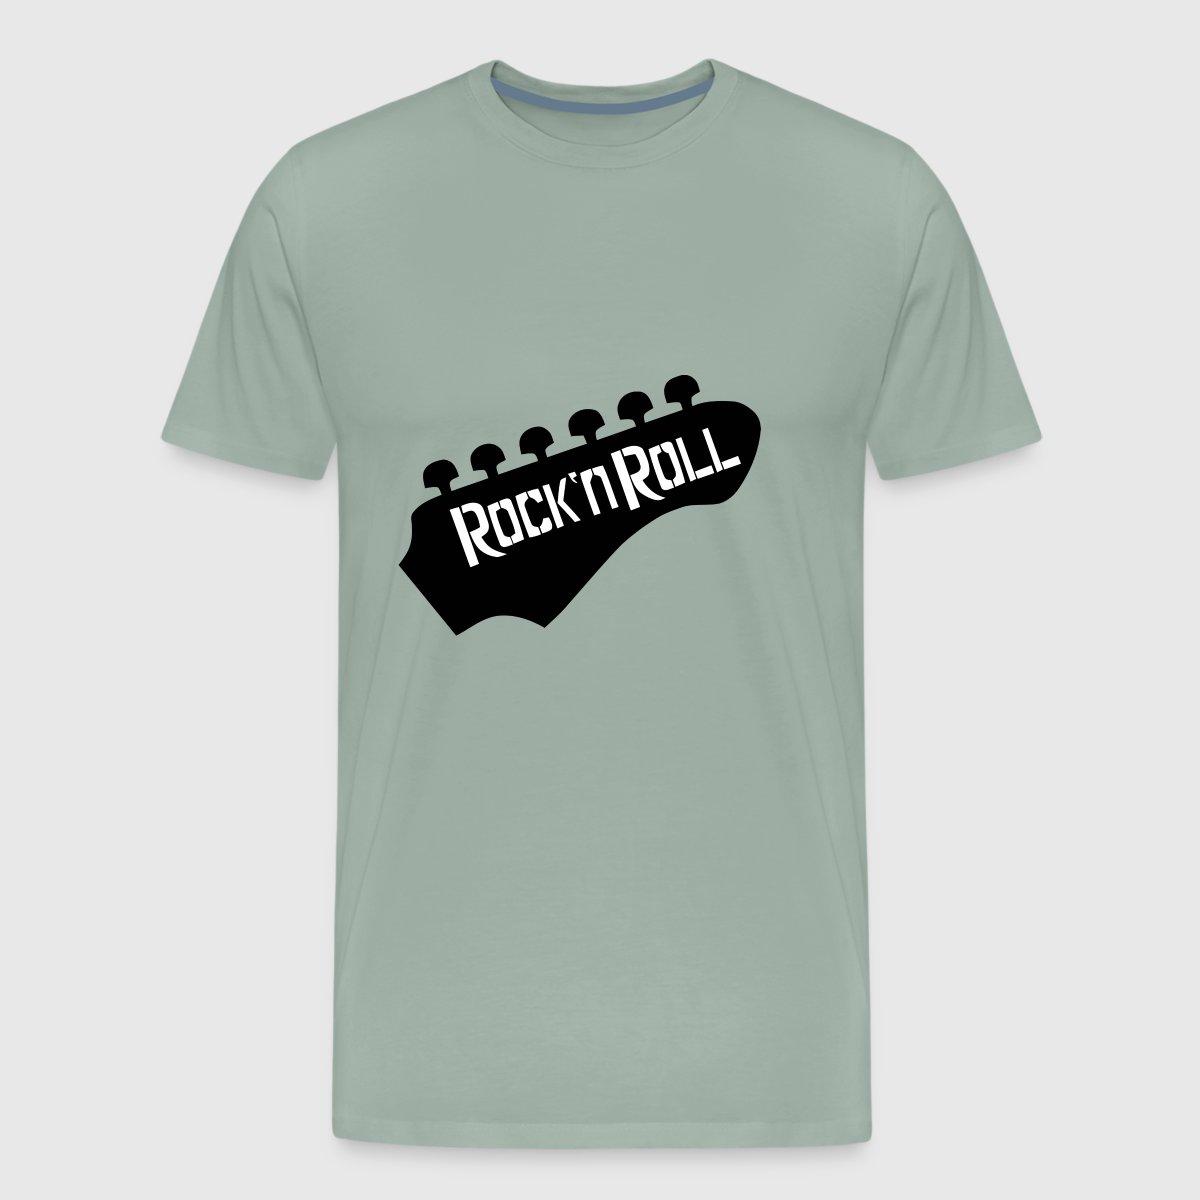 Rock N Roll T Shirt Designs Bcd Tofu House